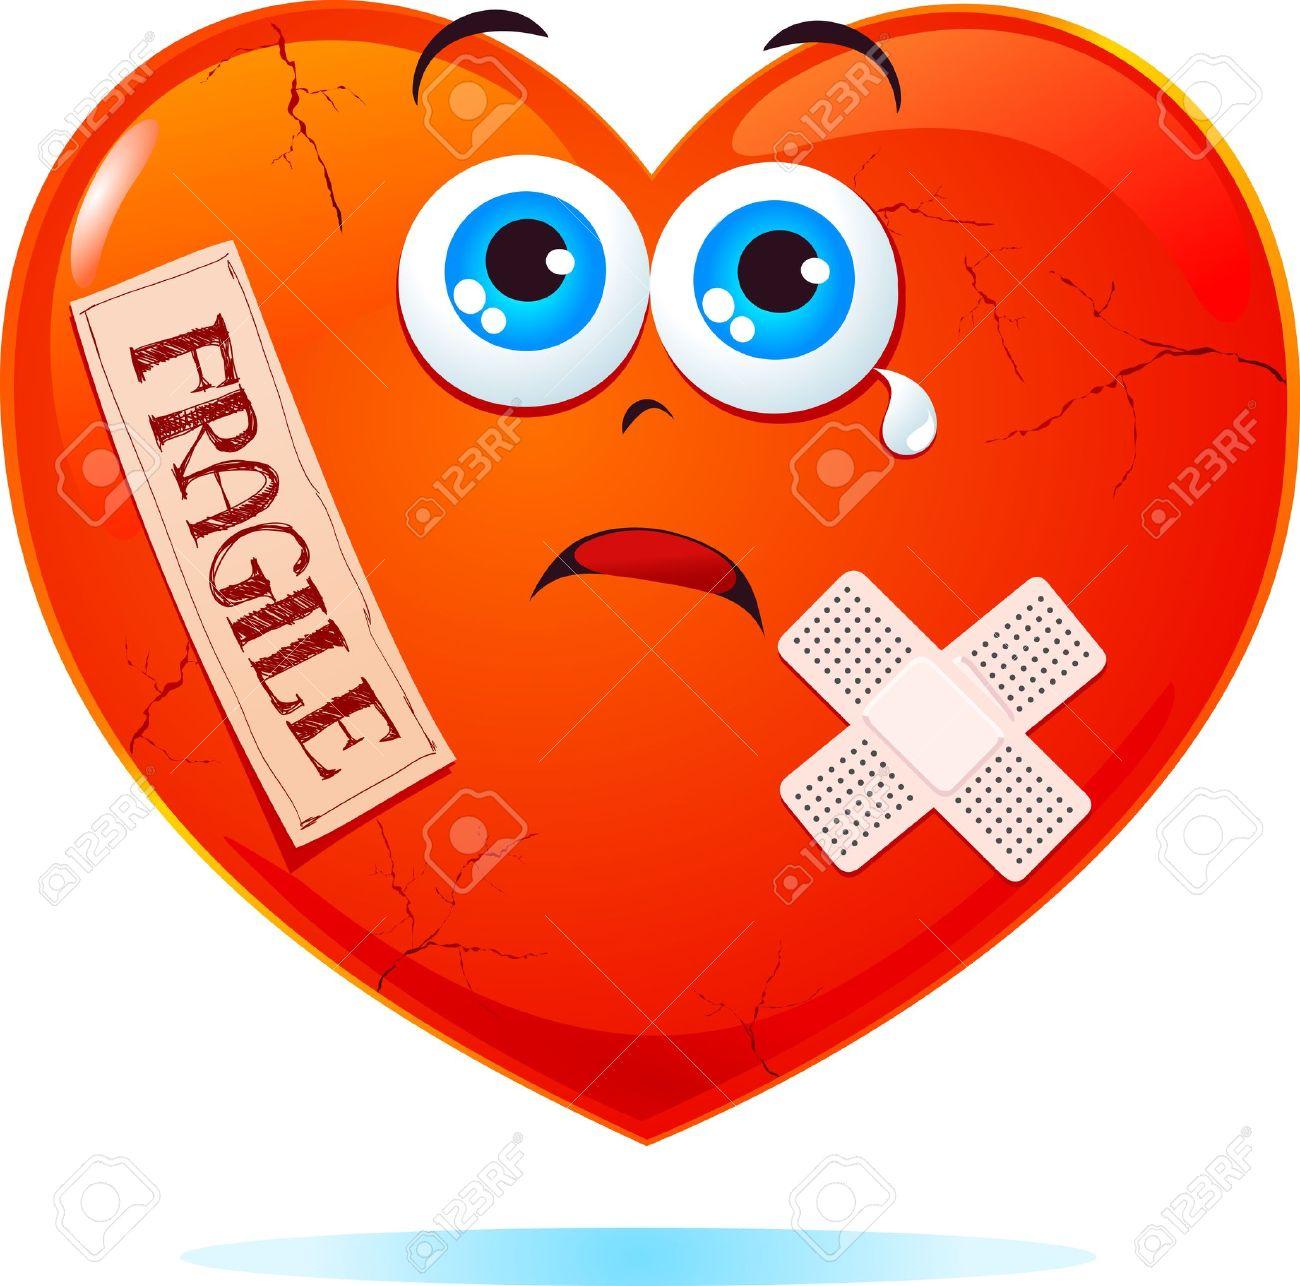 Broken heart labeled fragile - 9893145